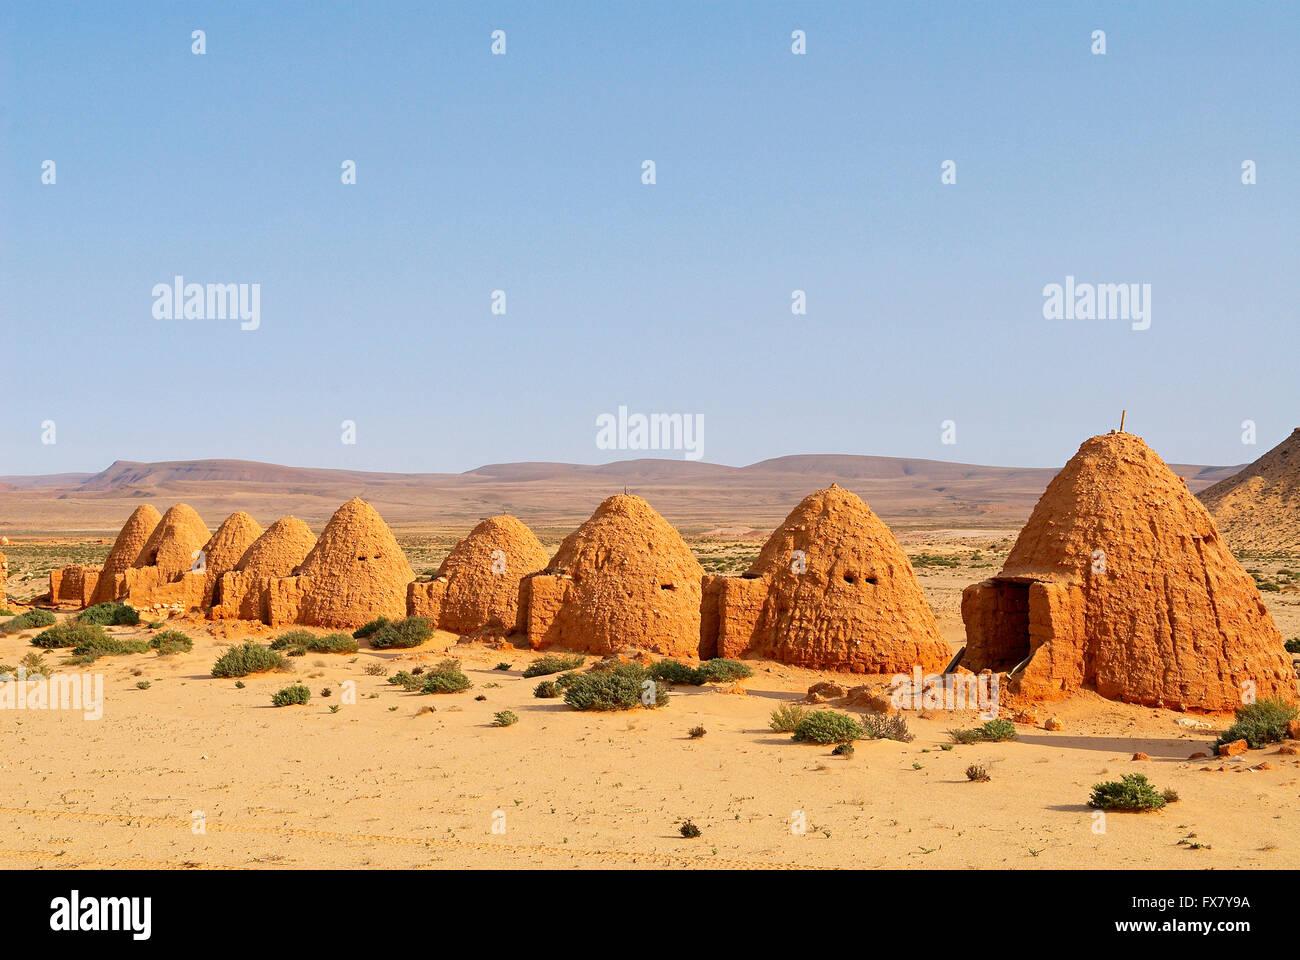 Morocco, Smara. Old army barraks, the Sahraoui, Former Spanish Sahara. - Stock Image